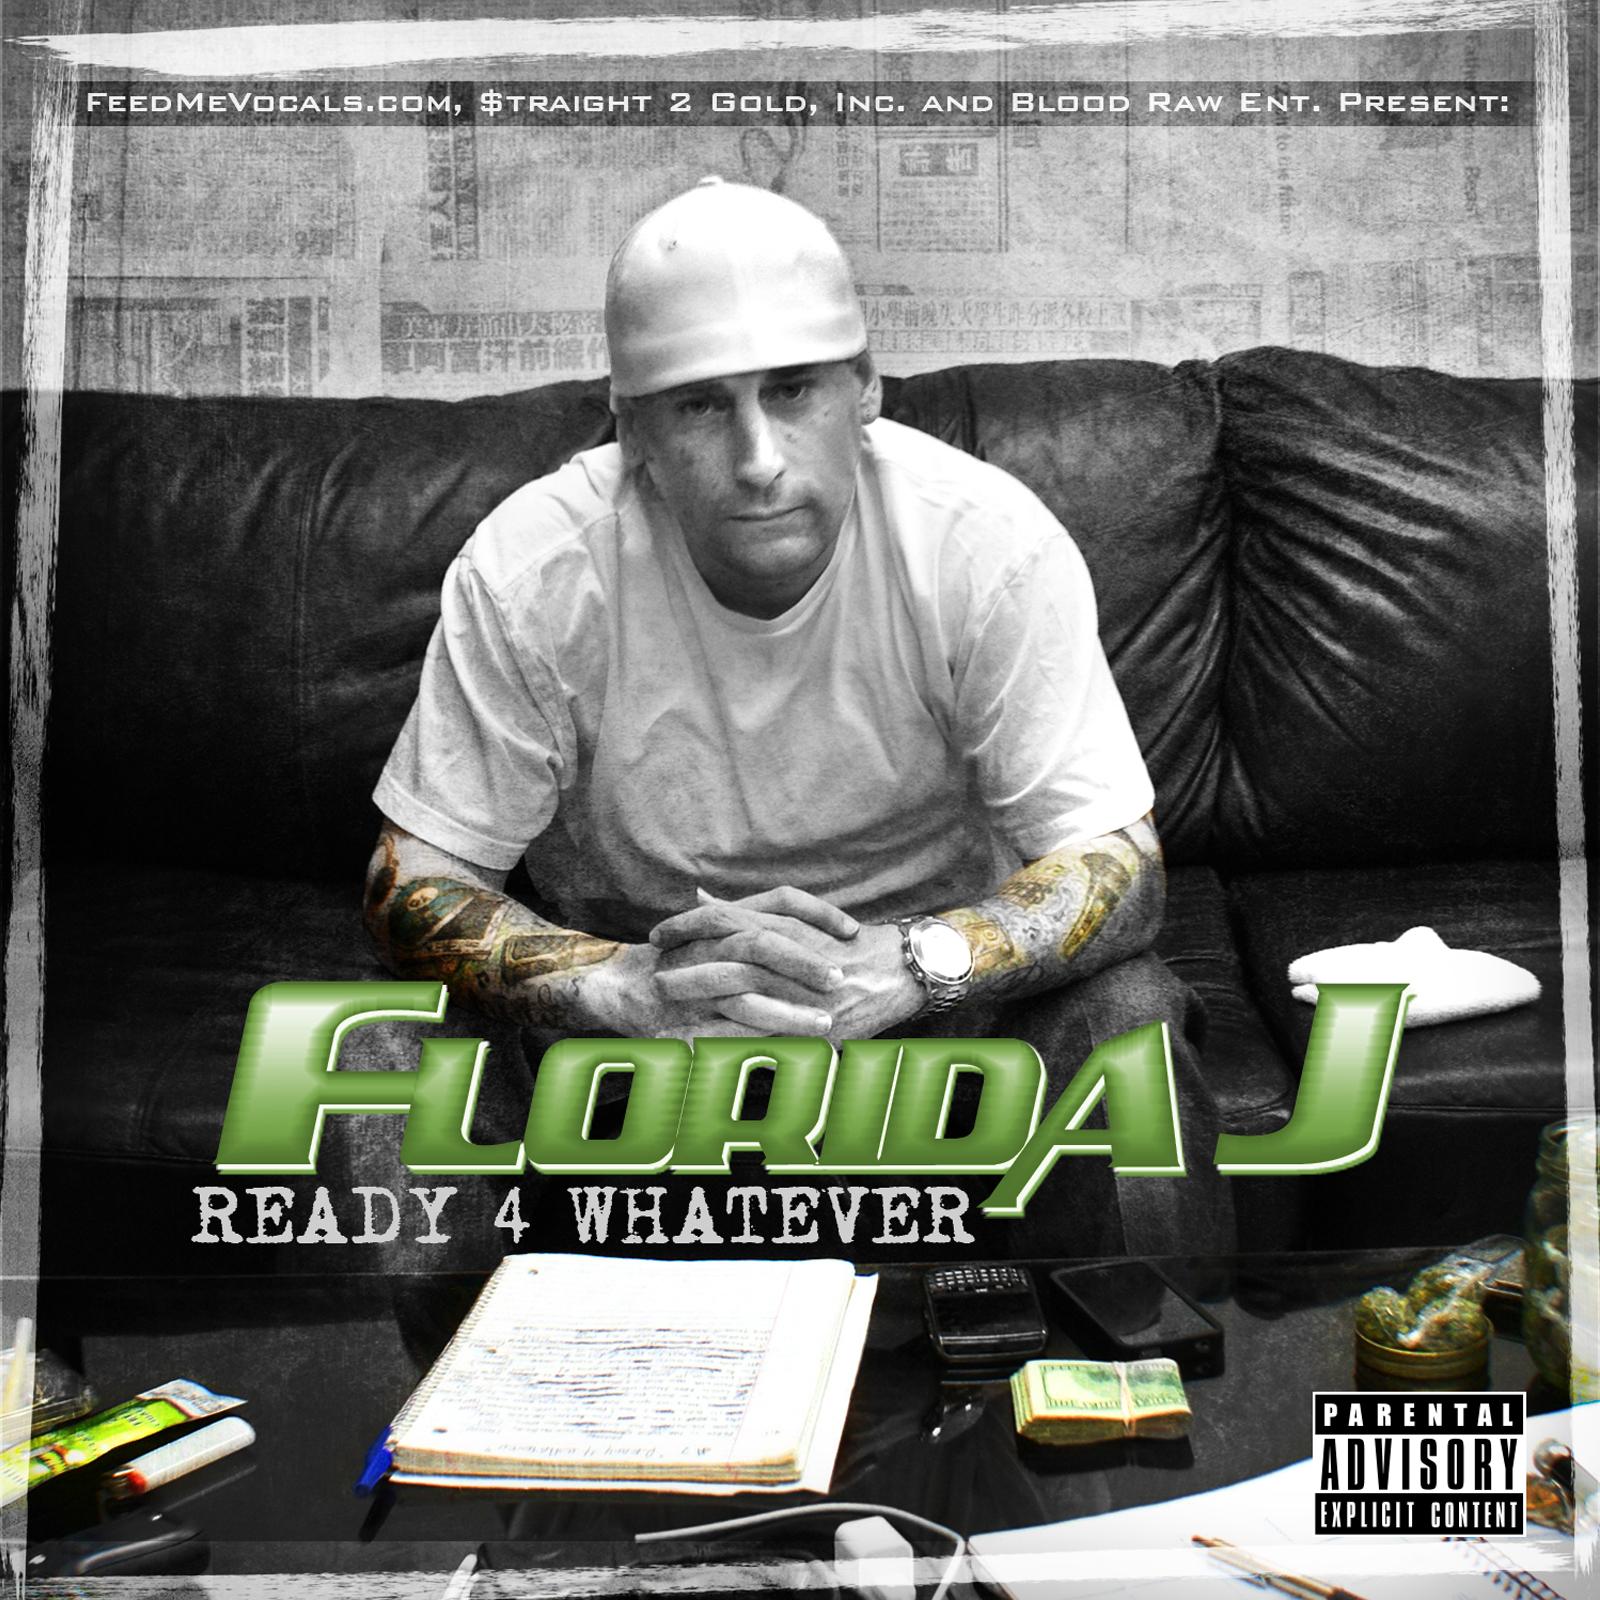 FLORIDA J - READY 4 WHATEVER (front artwork).jpg